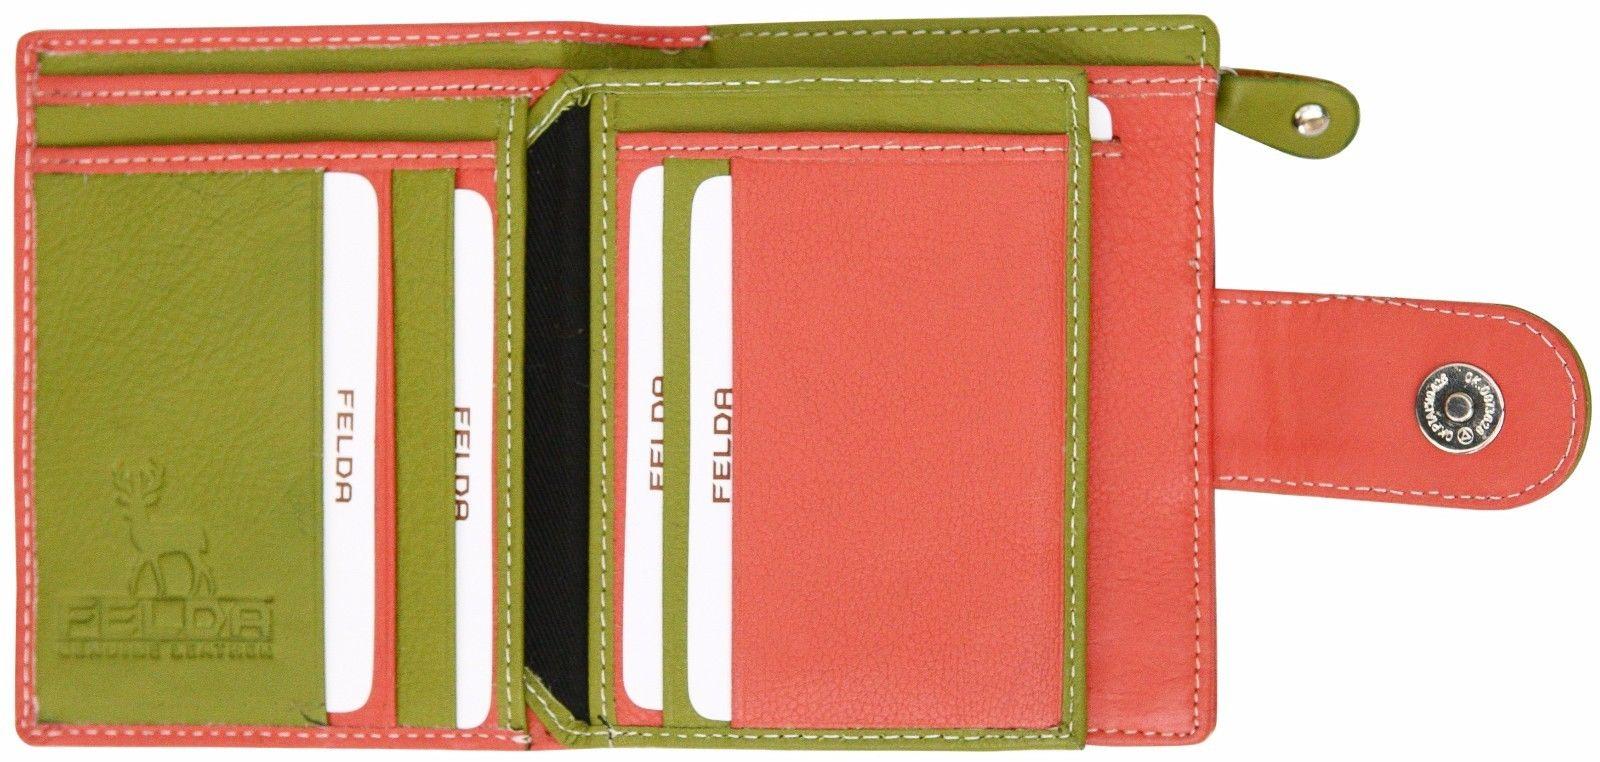 Felda-RFID-onorevoli-MEDAGLIA-amp-Card-Purse-Wallet-Genuine-Leather-Multi-SOFT-BOX-REGALO miniatura 26